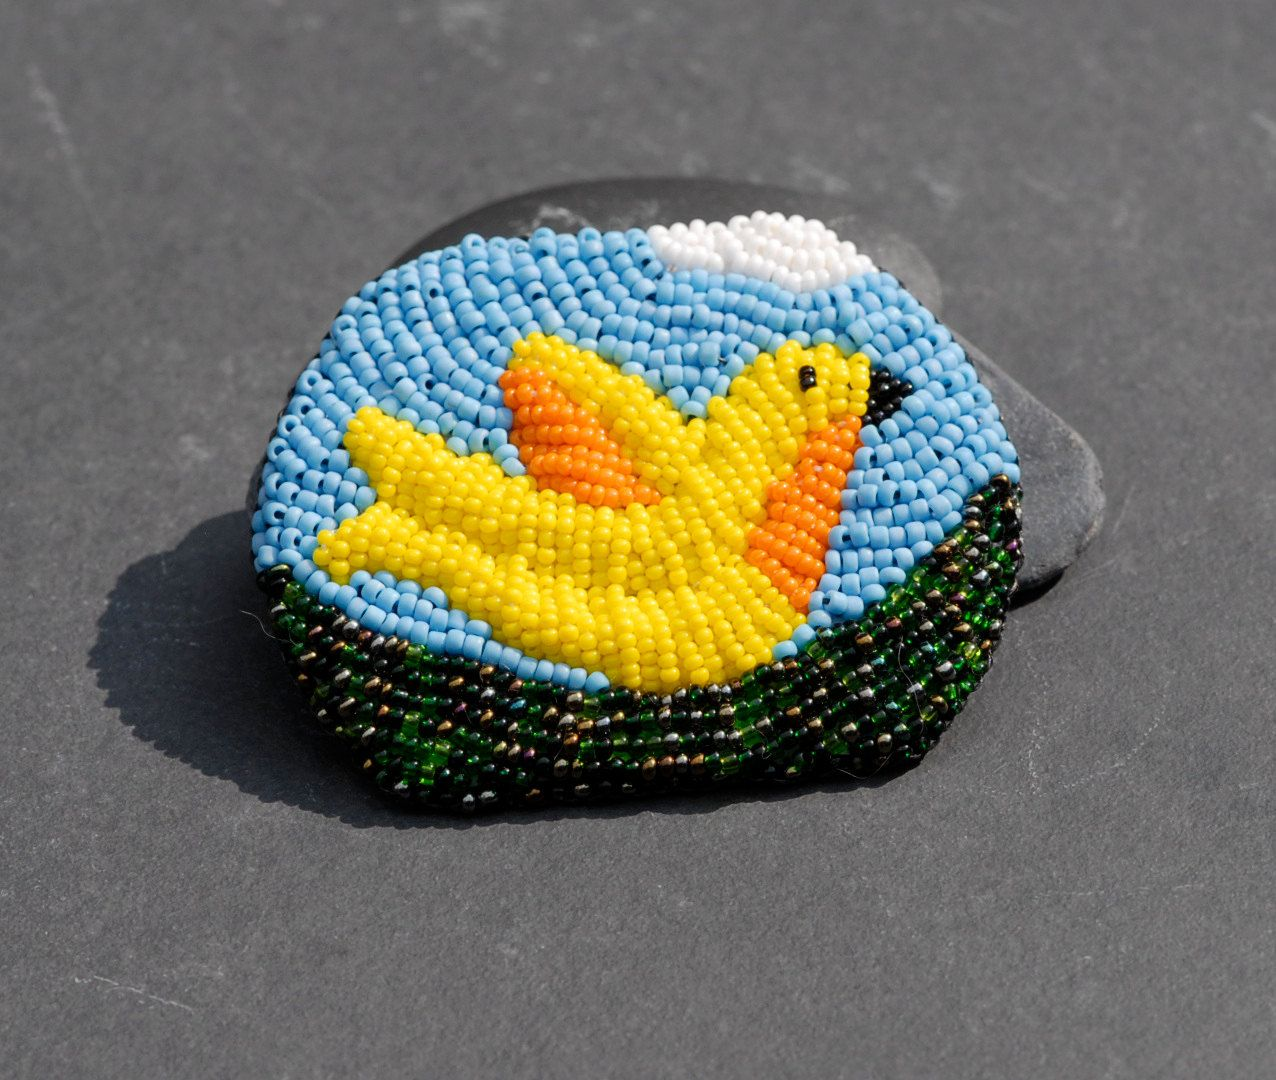 Blue skies brooch - bead embroidered yellow bird pin (56.00 USD) by FirepanJewellery